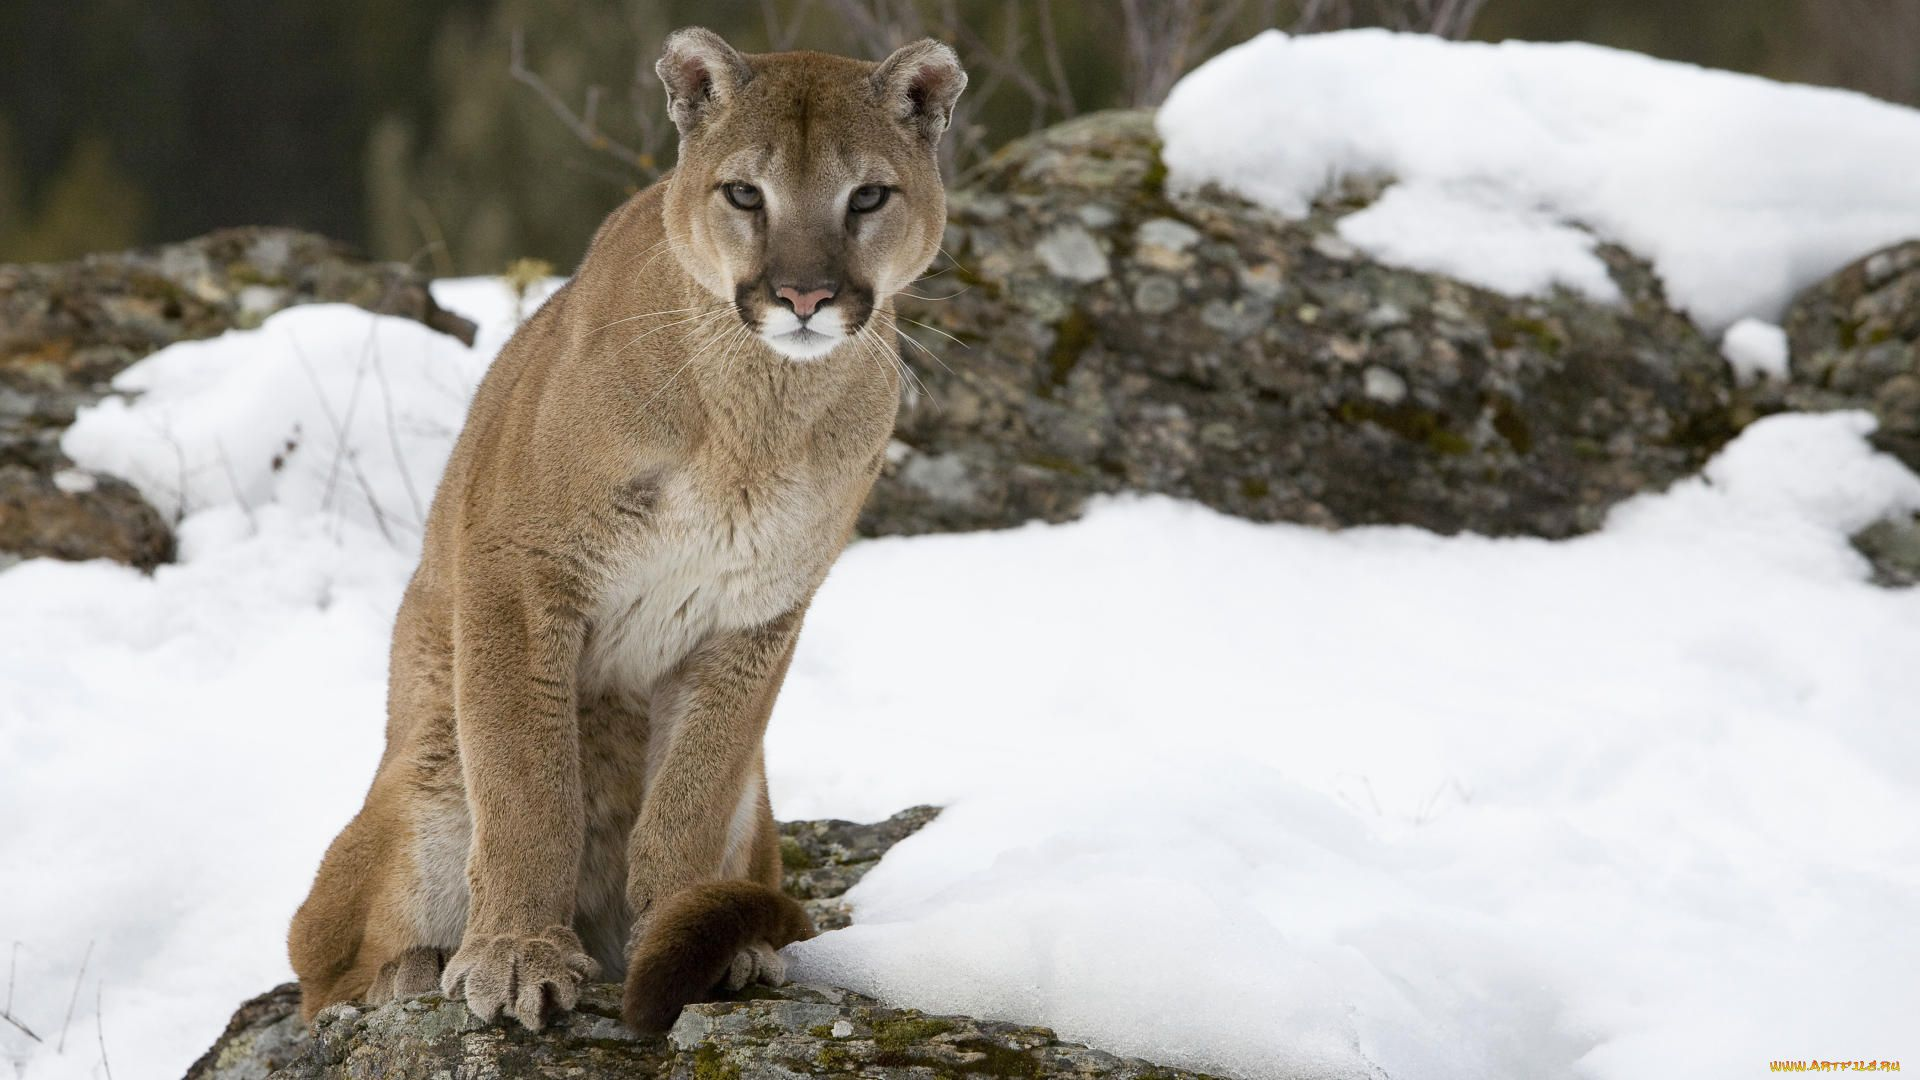 Cougar Hd 1080p wallpaper